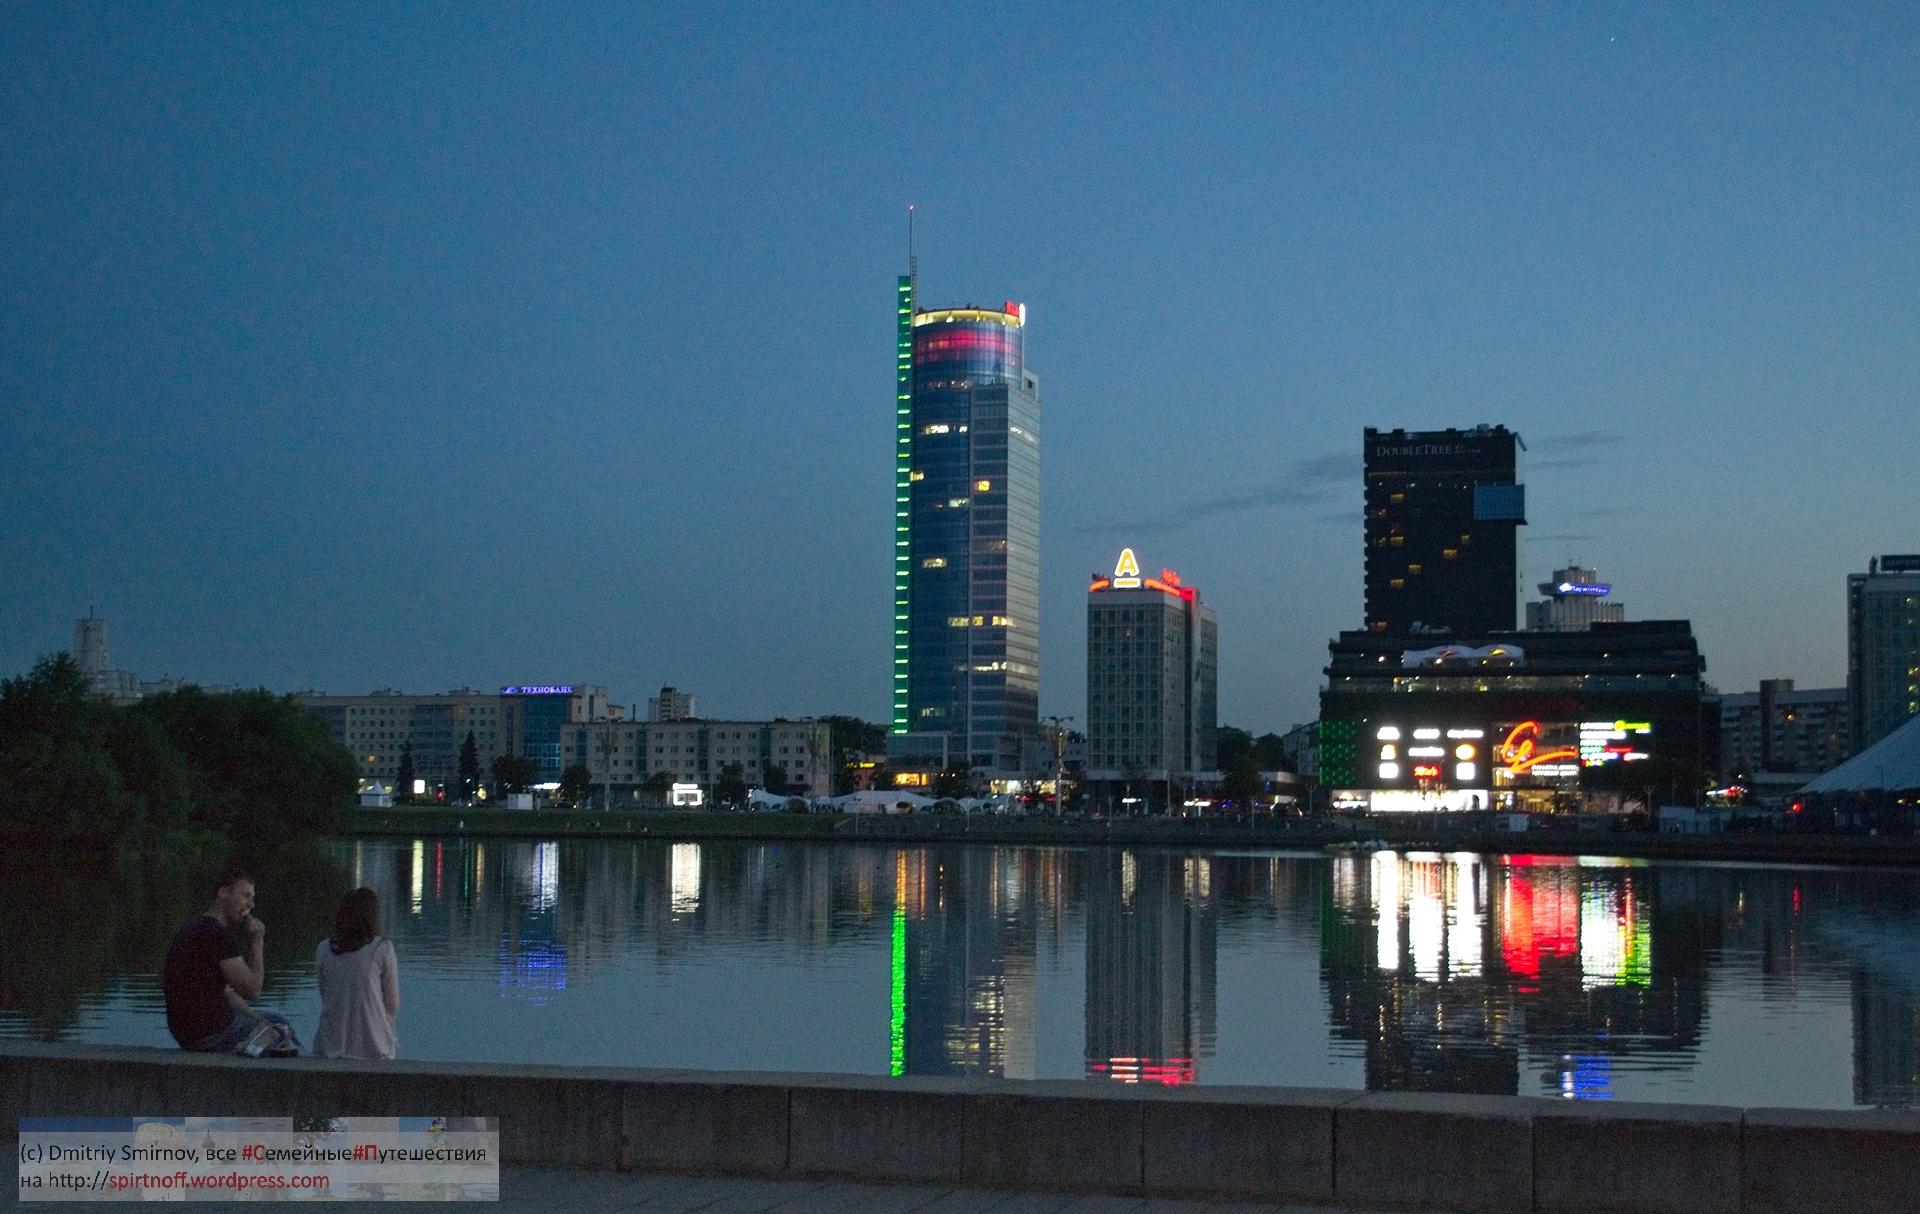 DSC_7309-71-Blog-27 Путешествия  Минск. Закат и город